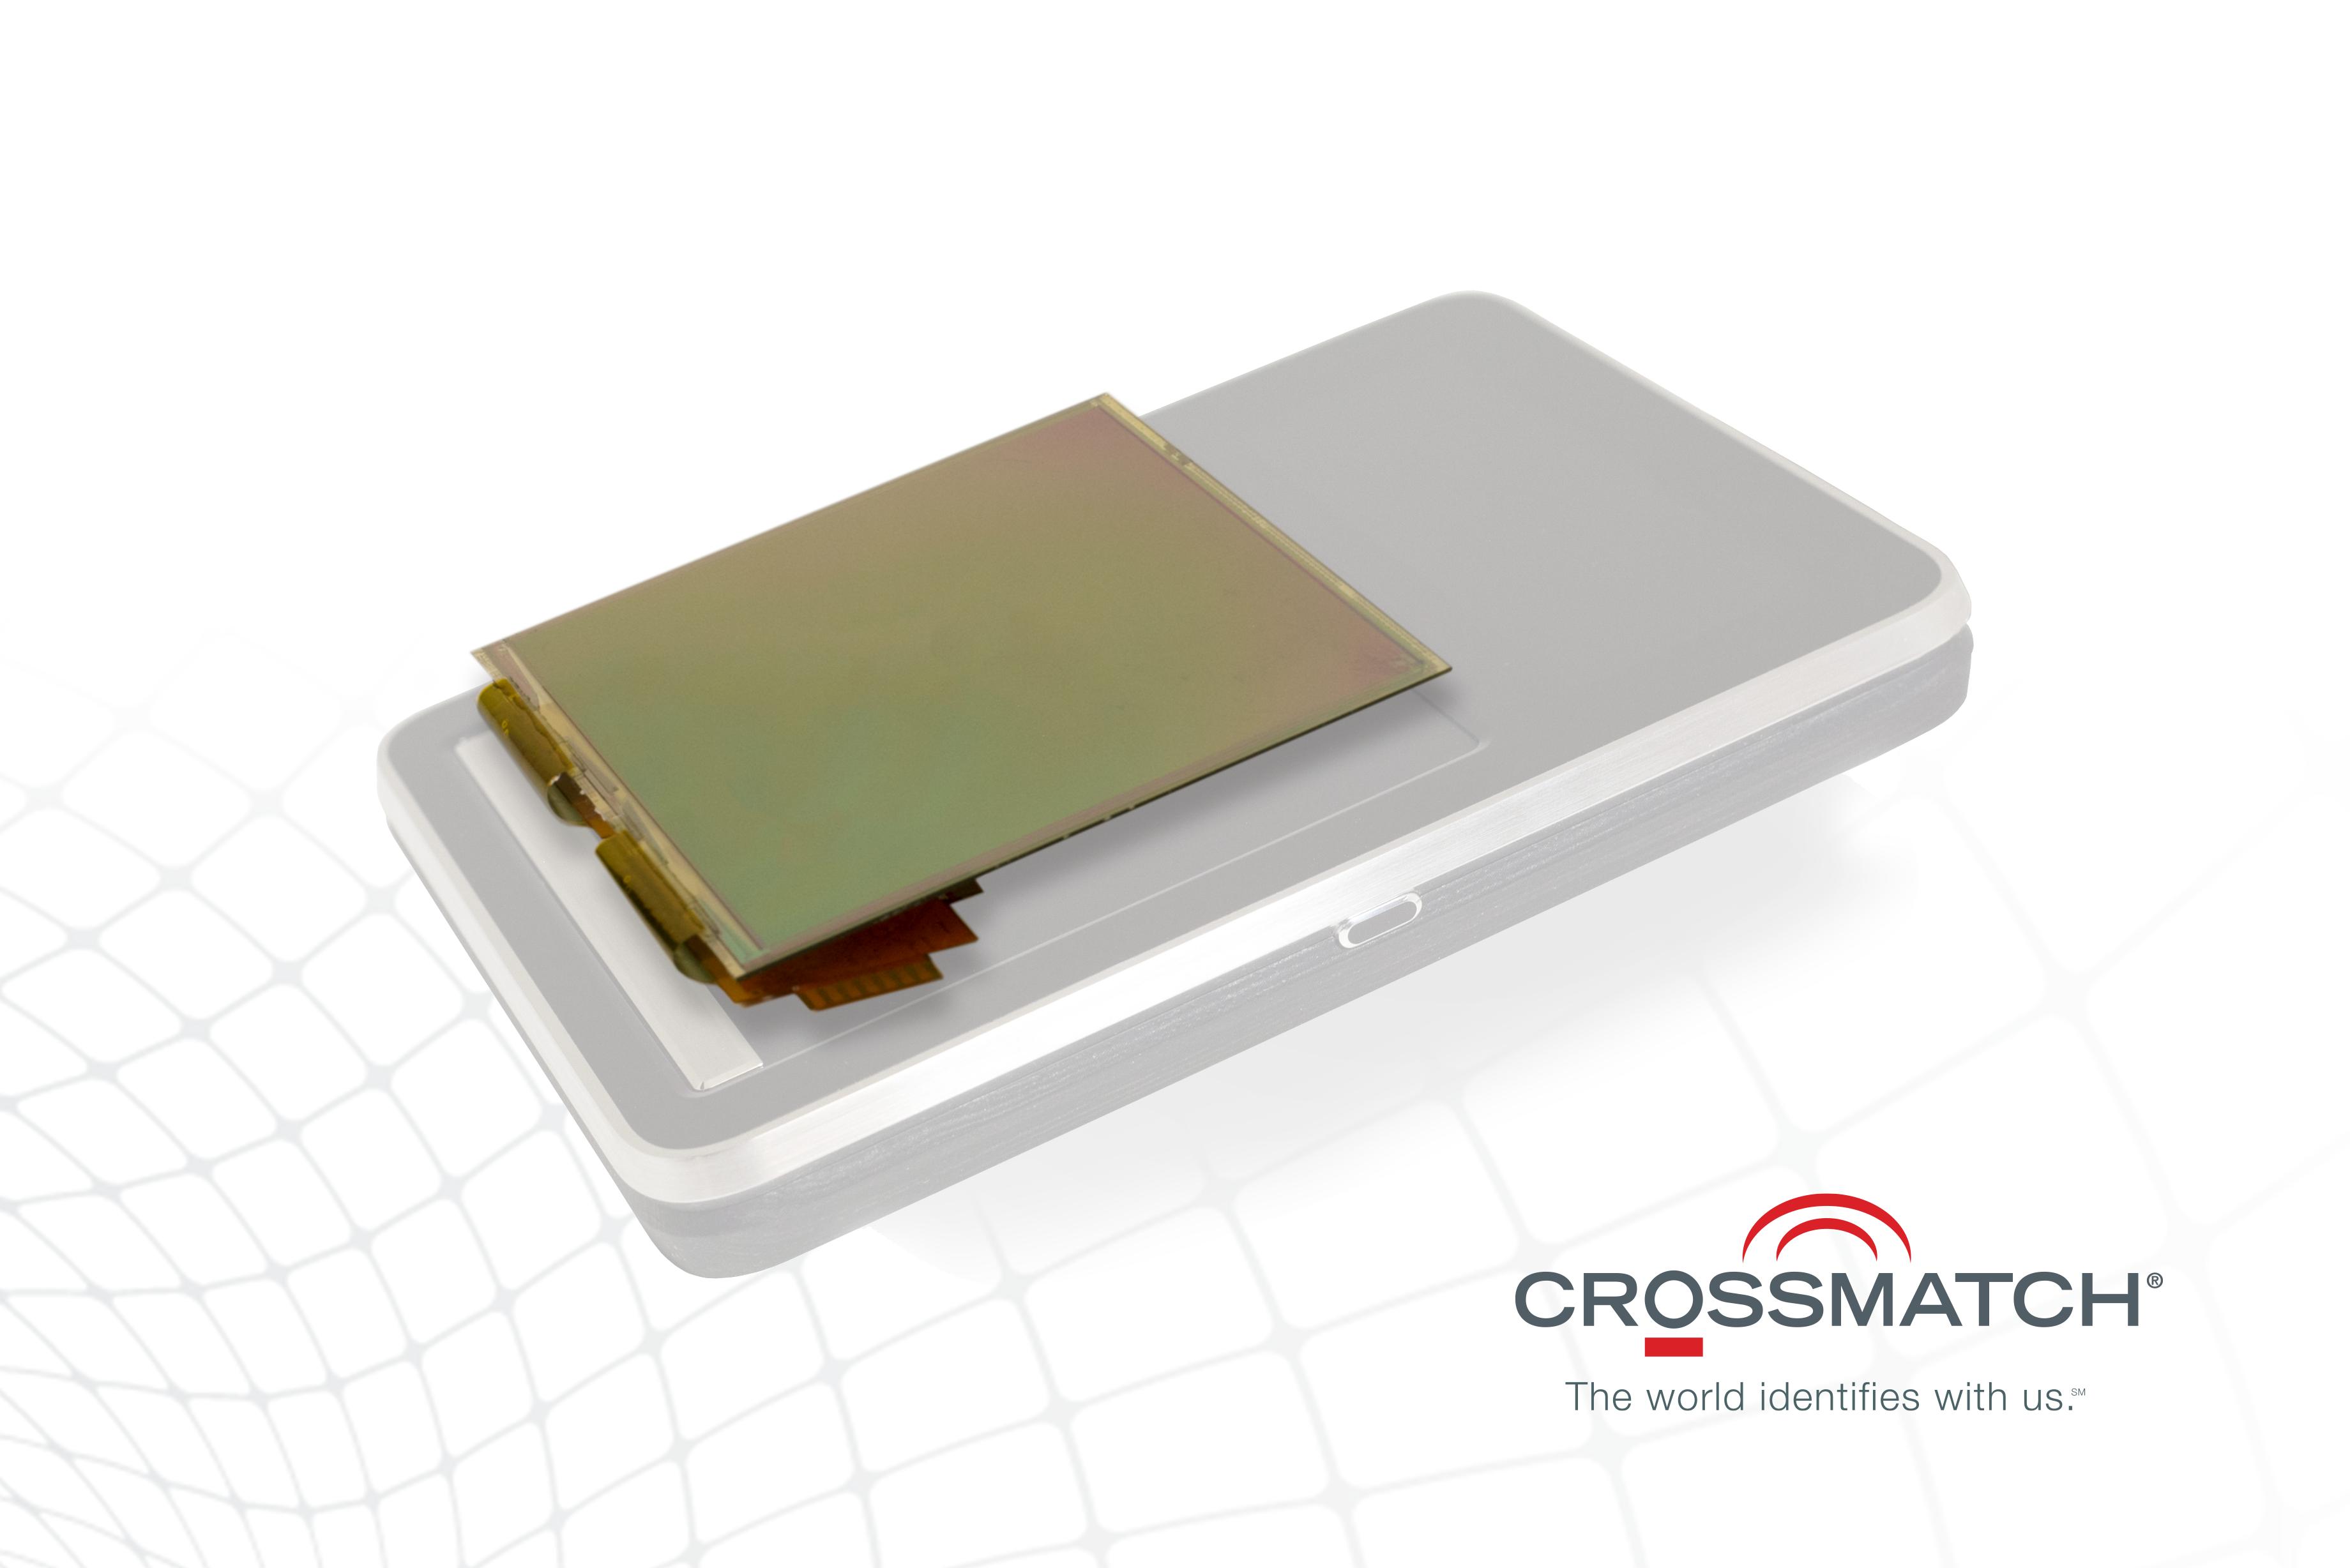 Crossmatch Introduces Innovative Mobile Ten-Print Technology